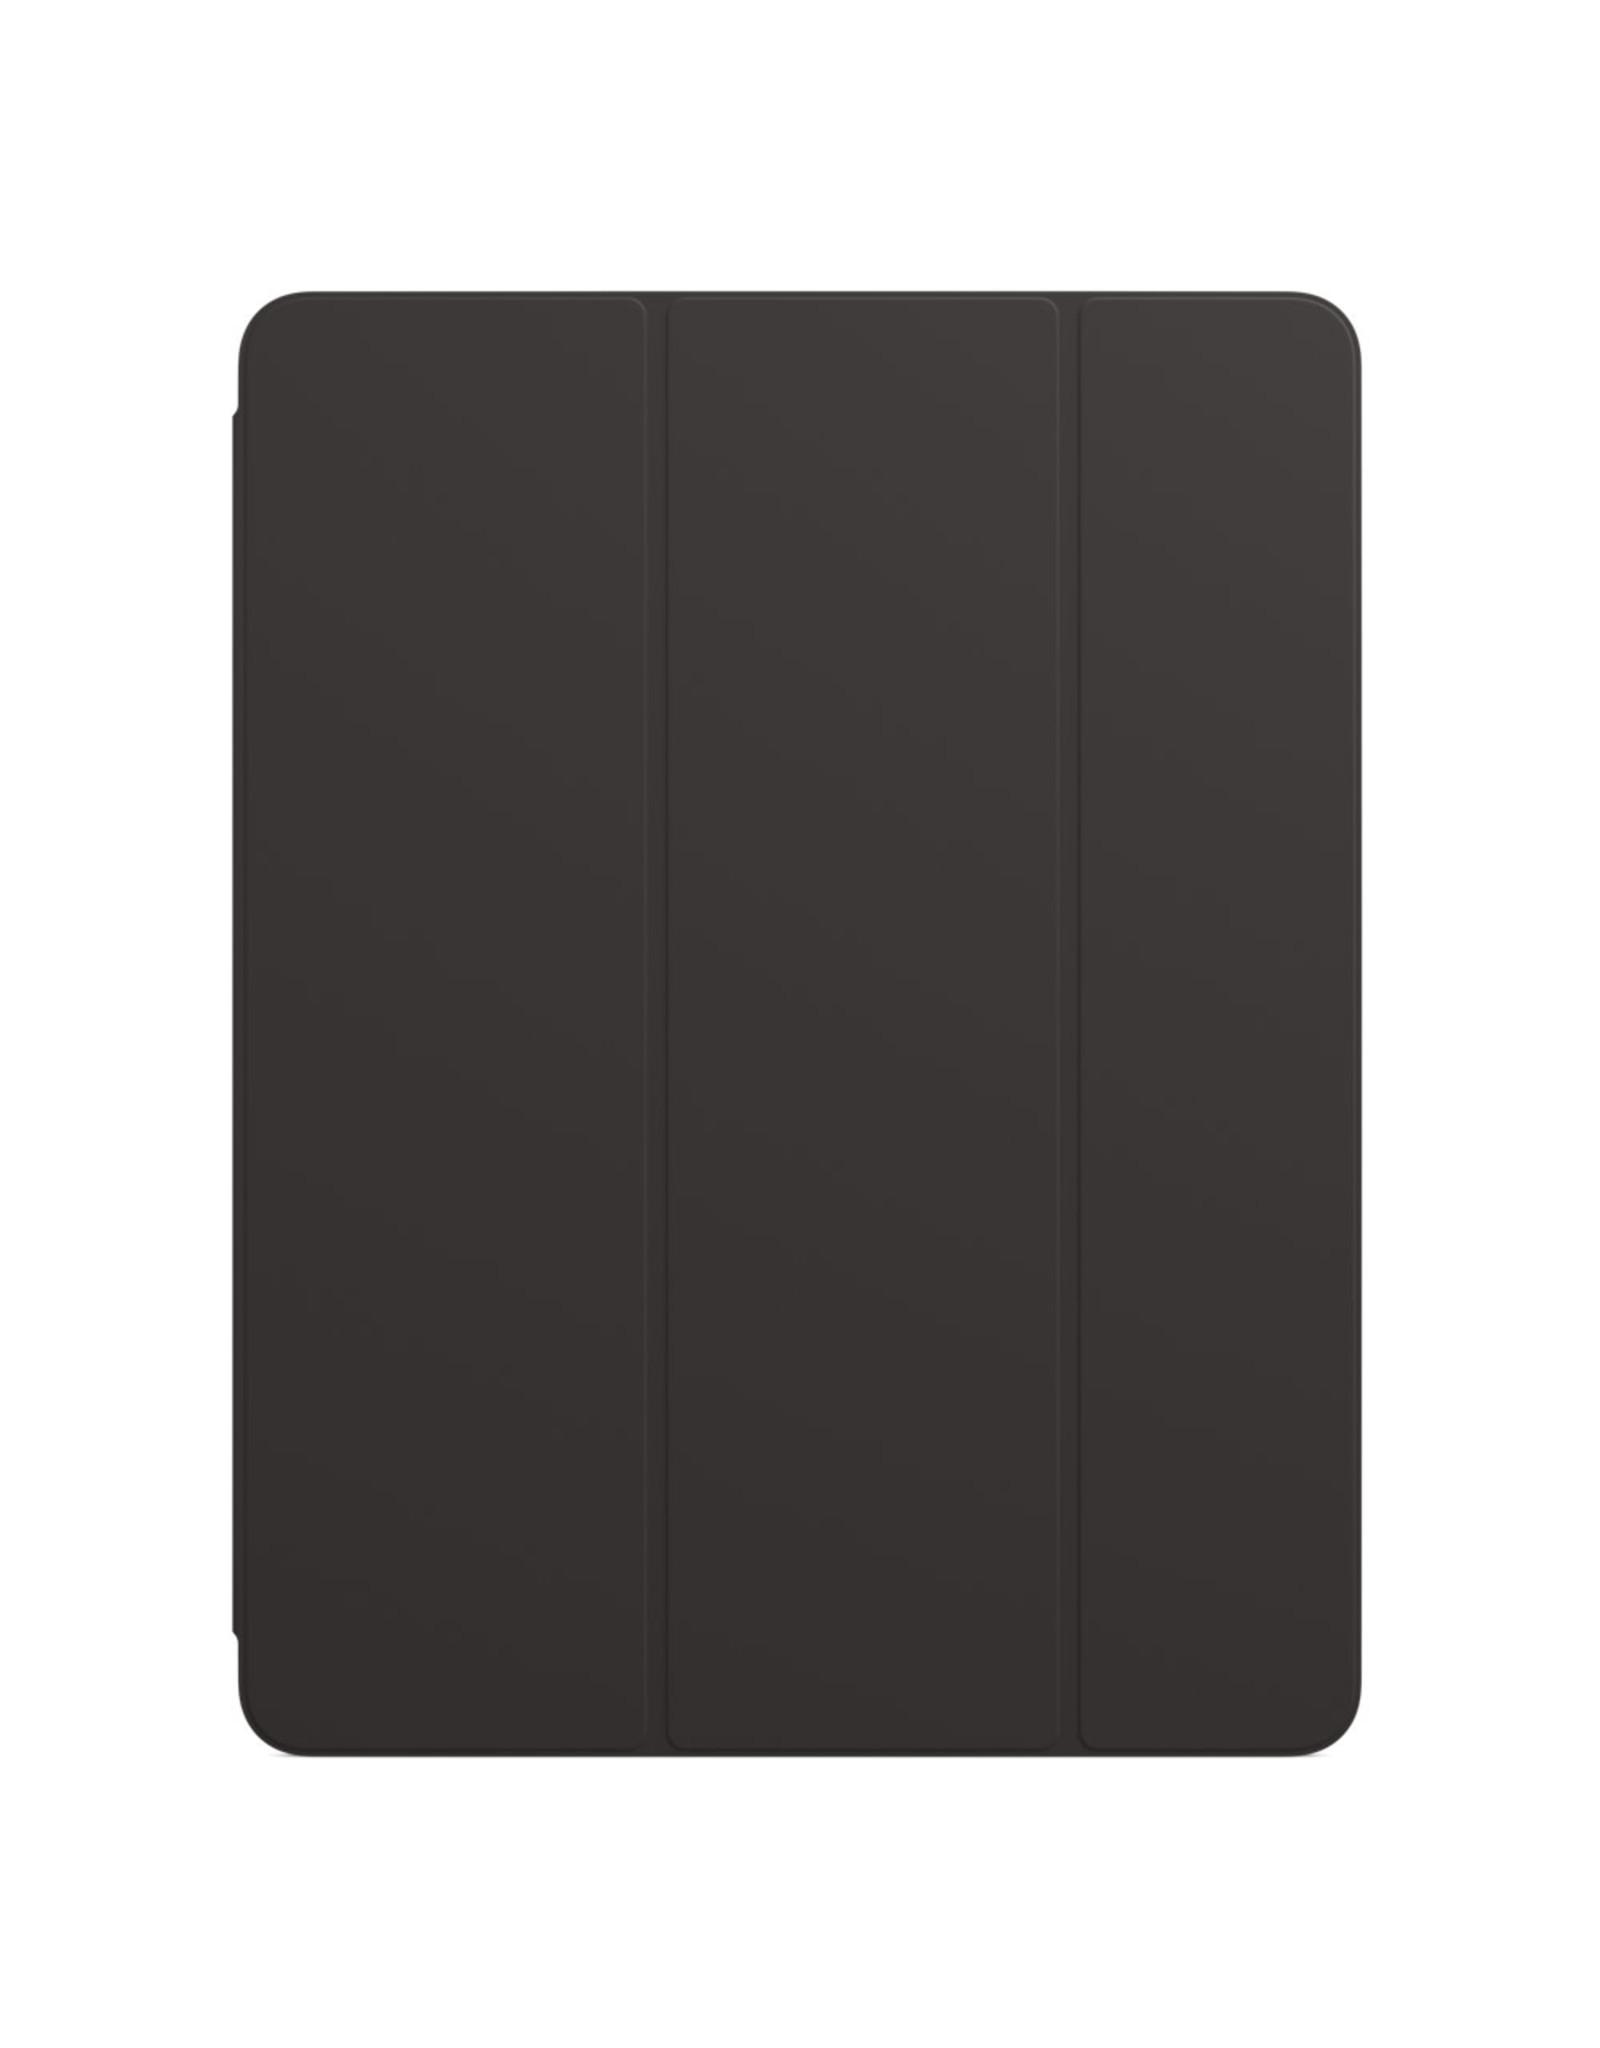 Apple Apple Smart Folio for iPad Pro 12.9-inch (5th generation) - Black